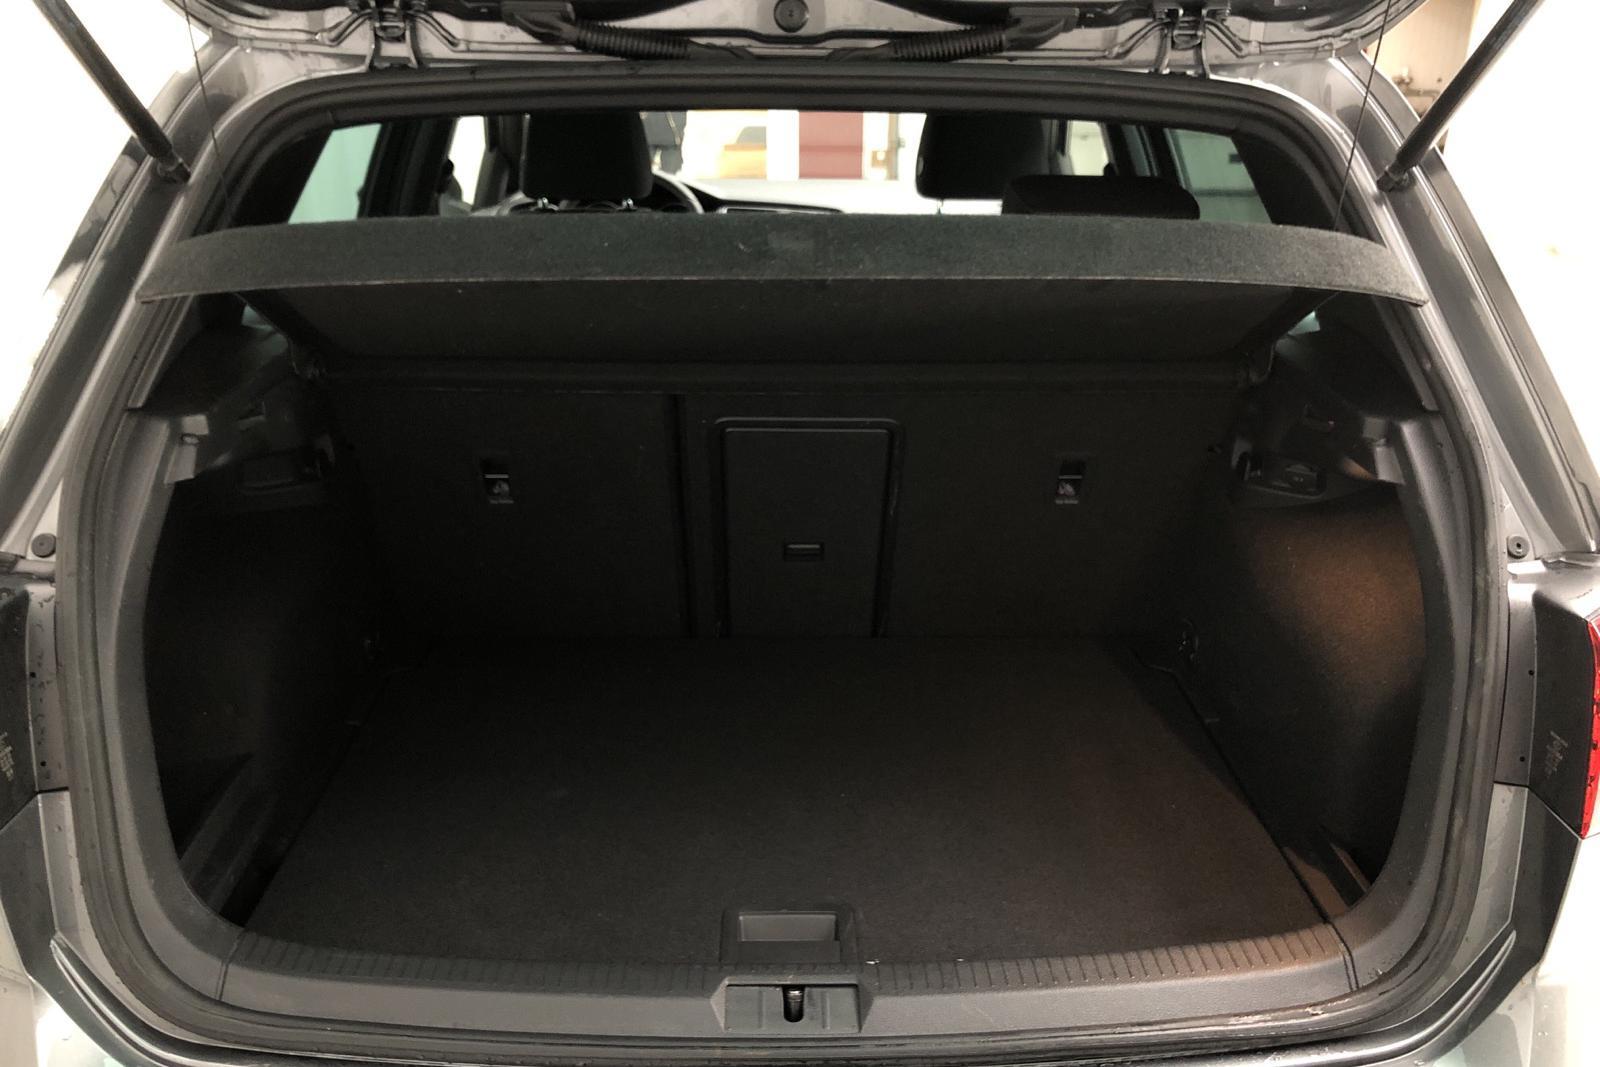 VW Golf VII 1.5 TSI 5dr (150hk) - 13 600 km - Manual - Dark Grey - 2019